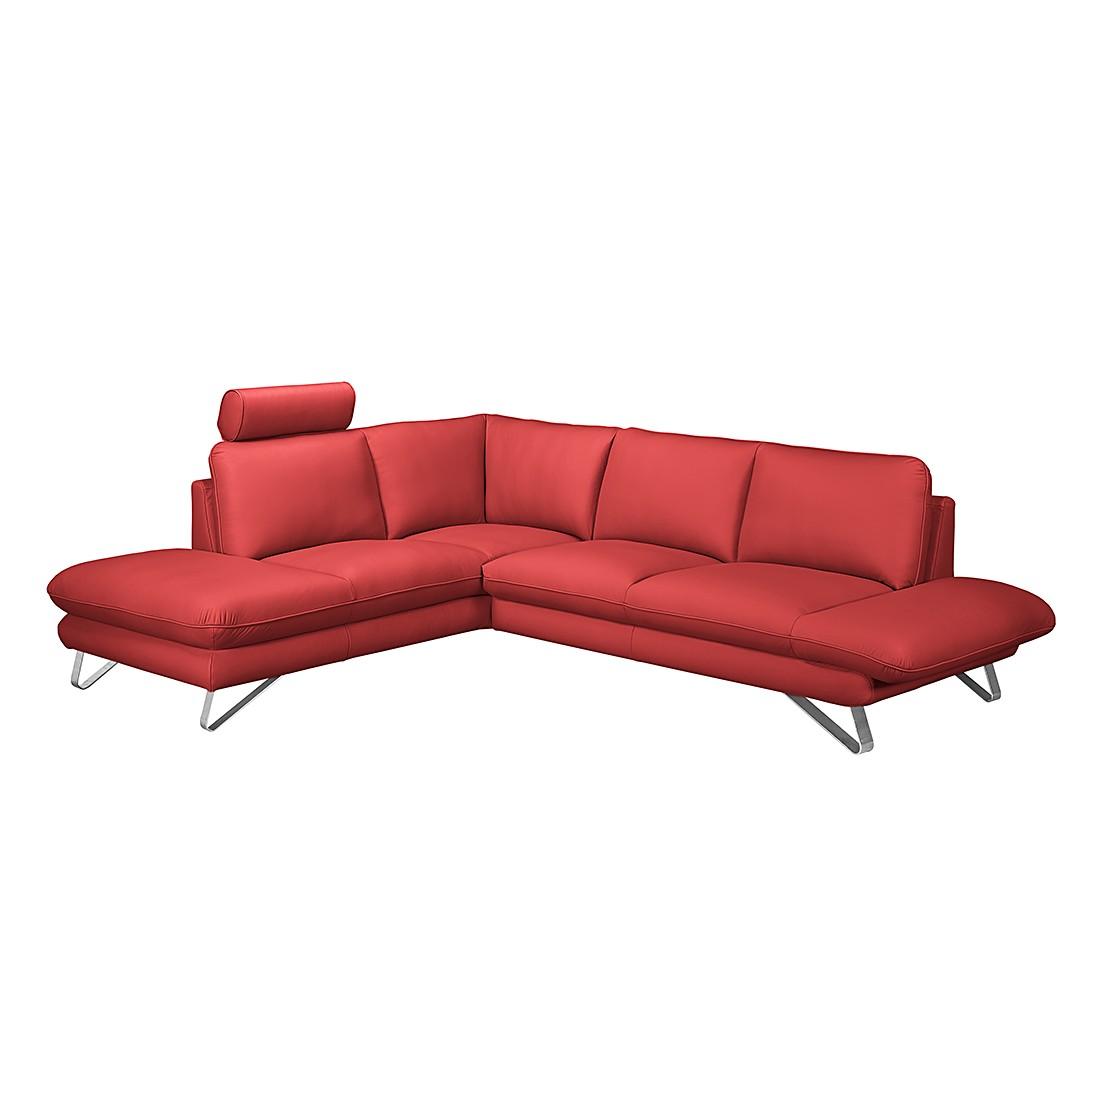 home24 Fredriks Ecksofa Enzo 2,5-Sitzer Kaminrot Echtleder 276x83x220 cm (BxHxT) Modern